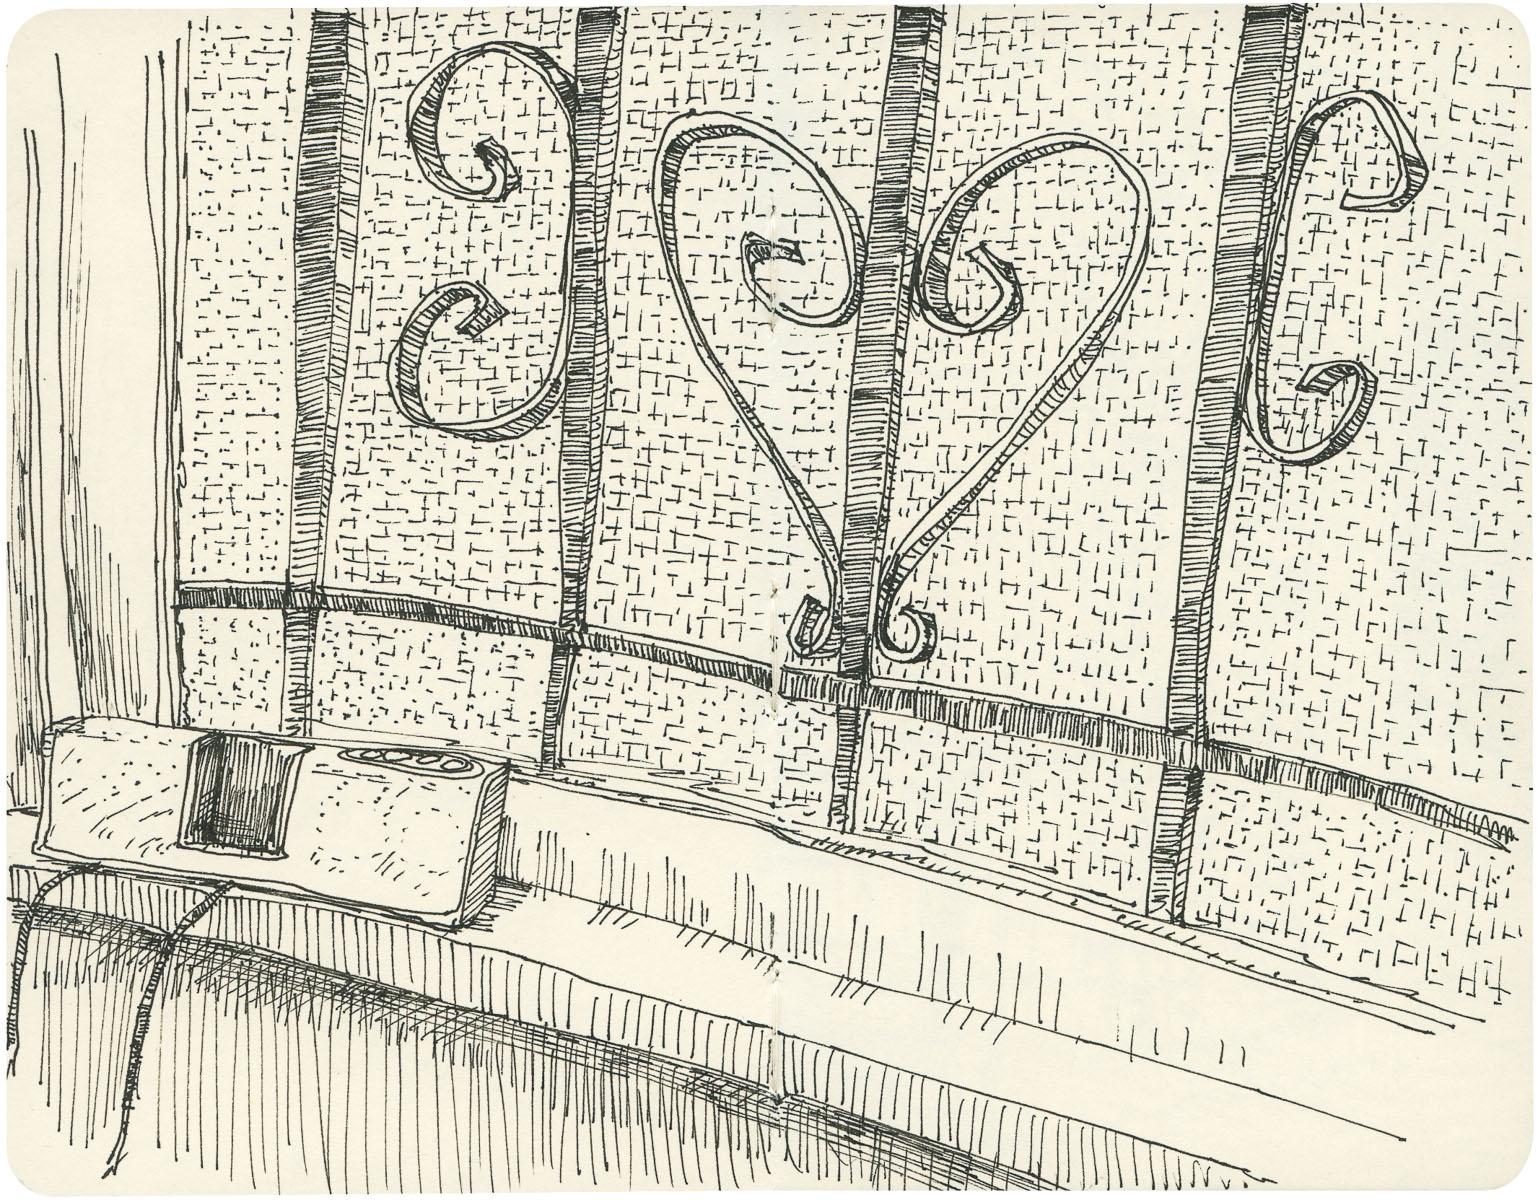 Sketchbook: Windowsill